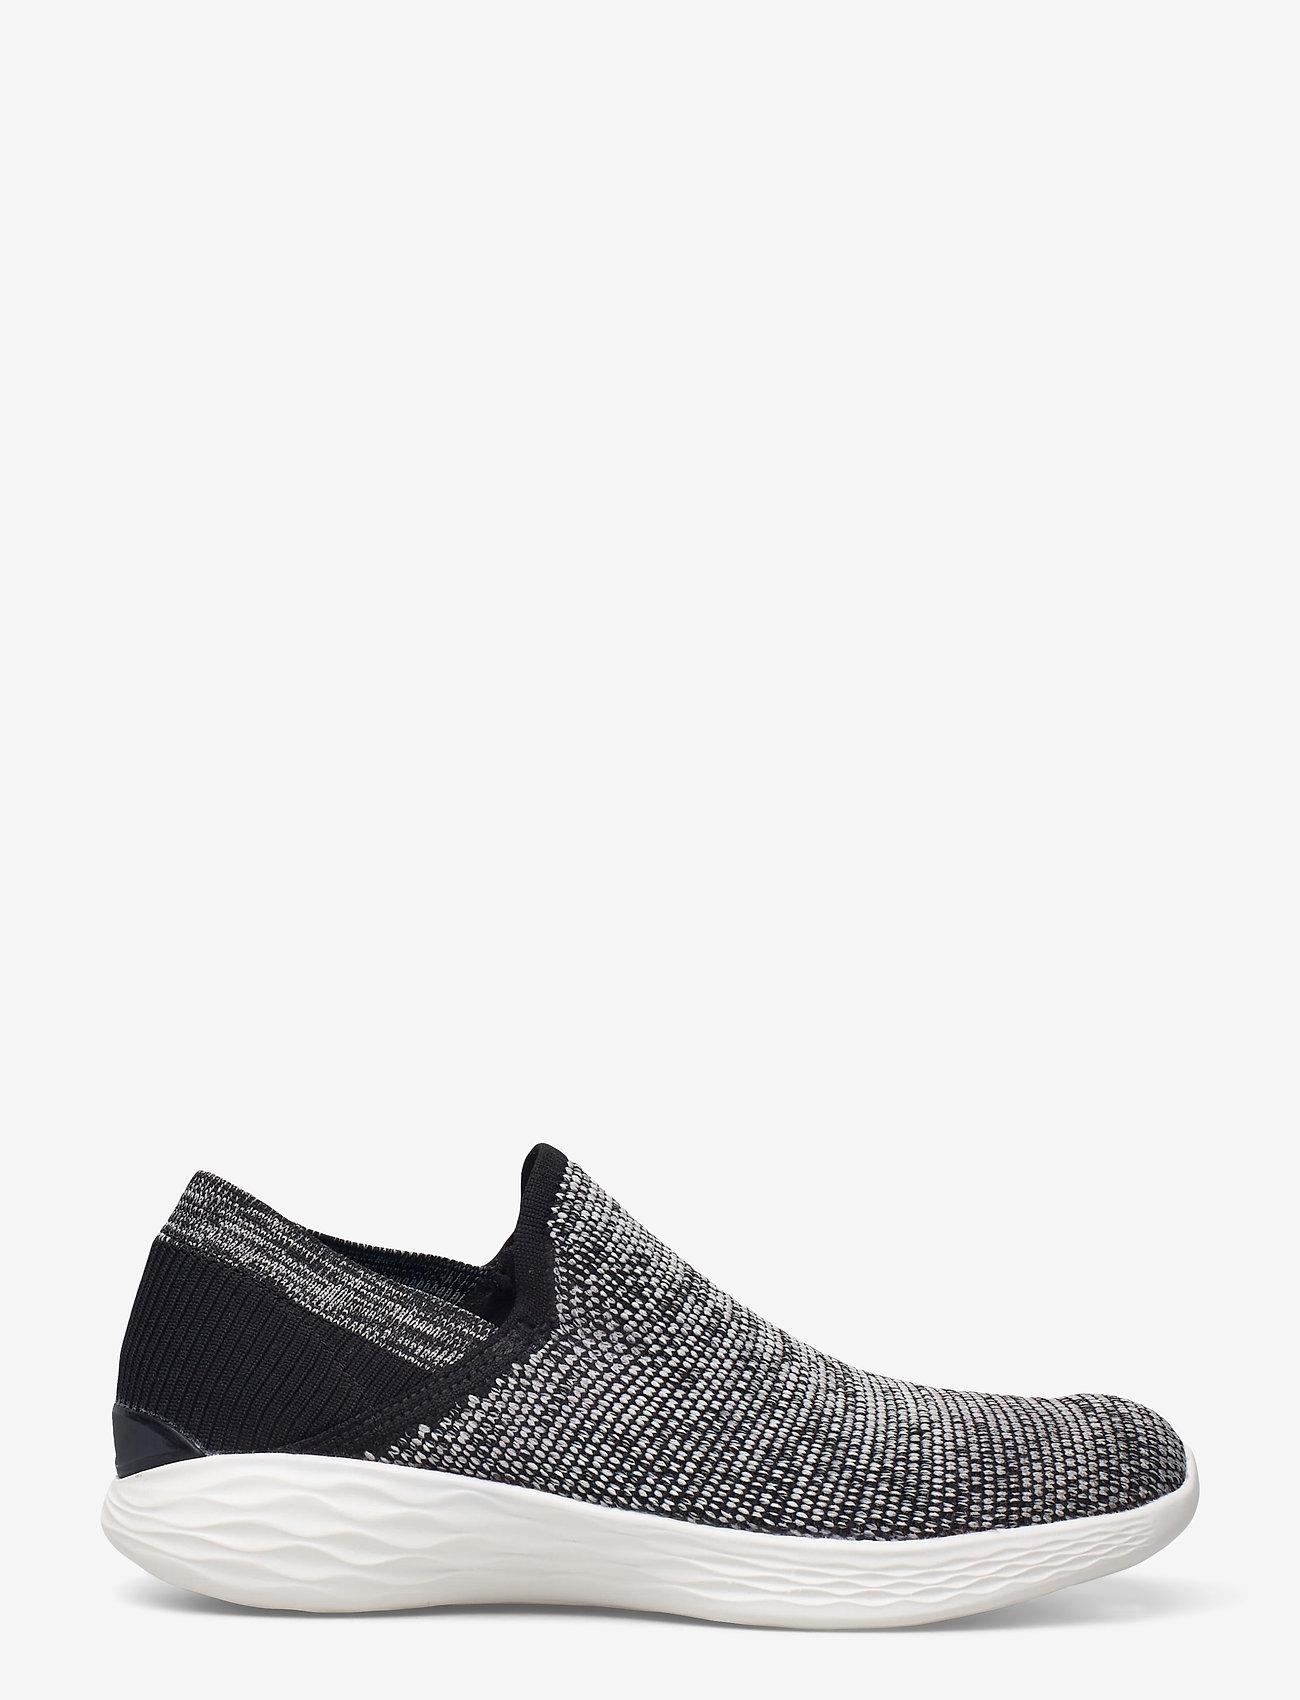 Skechers - Womens YOU - Rise - slip-on sneakers - bkw black white - 1